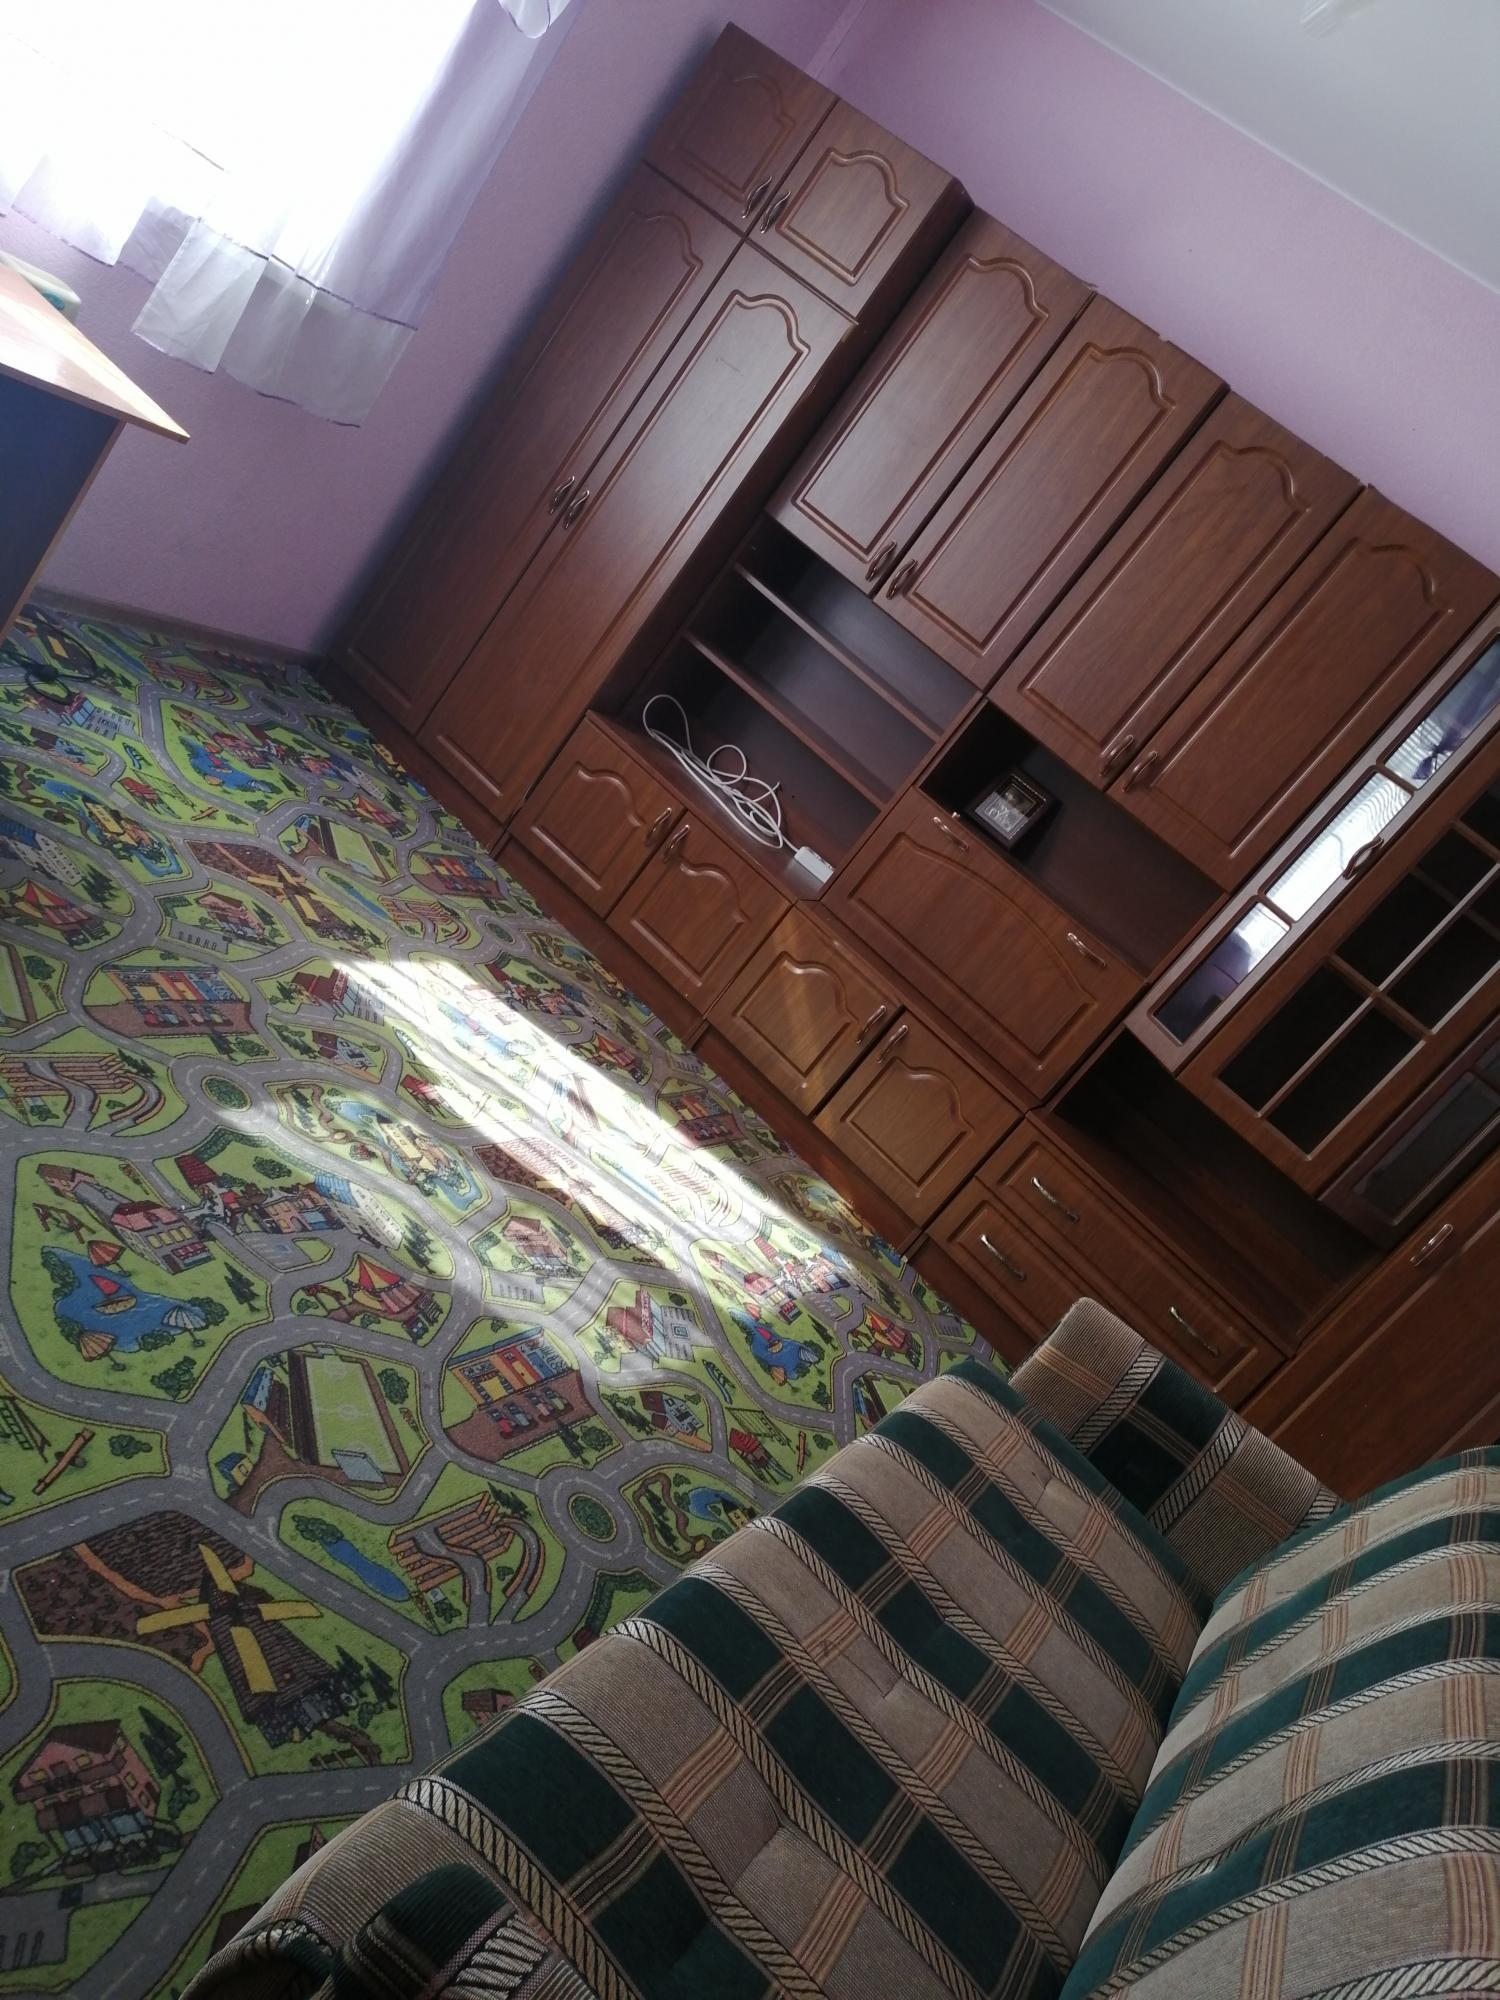 Apartment, 2 rooms, 60 m2 in Ivanteevka 89037472021 buy 1